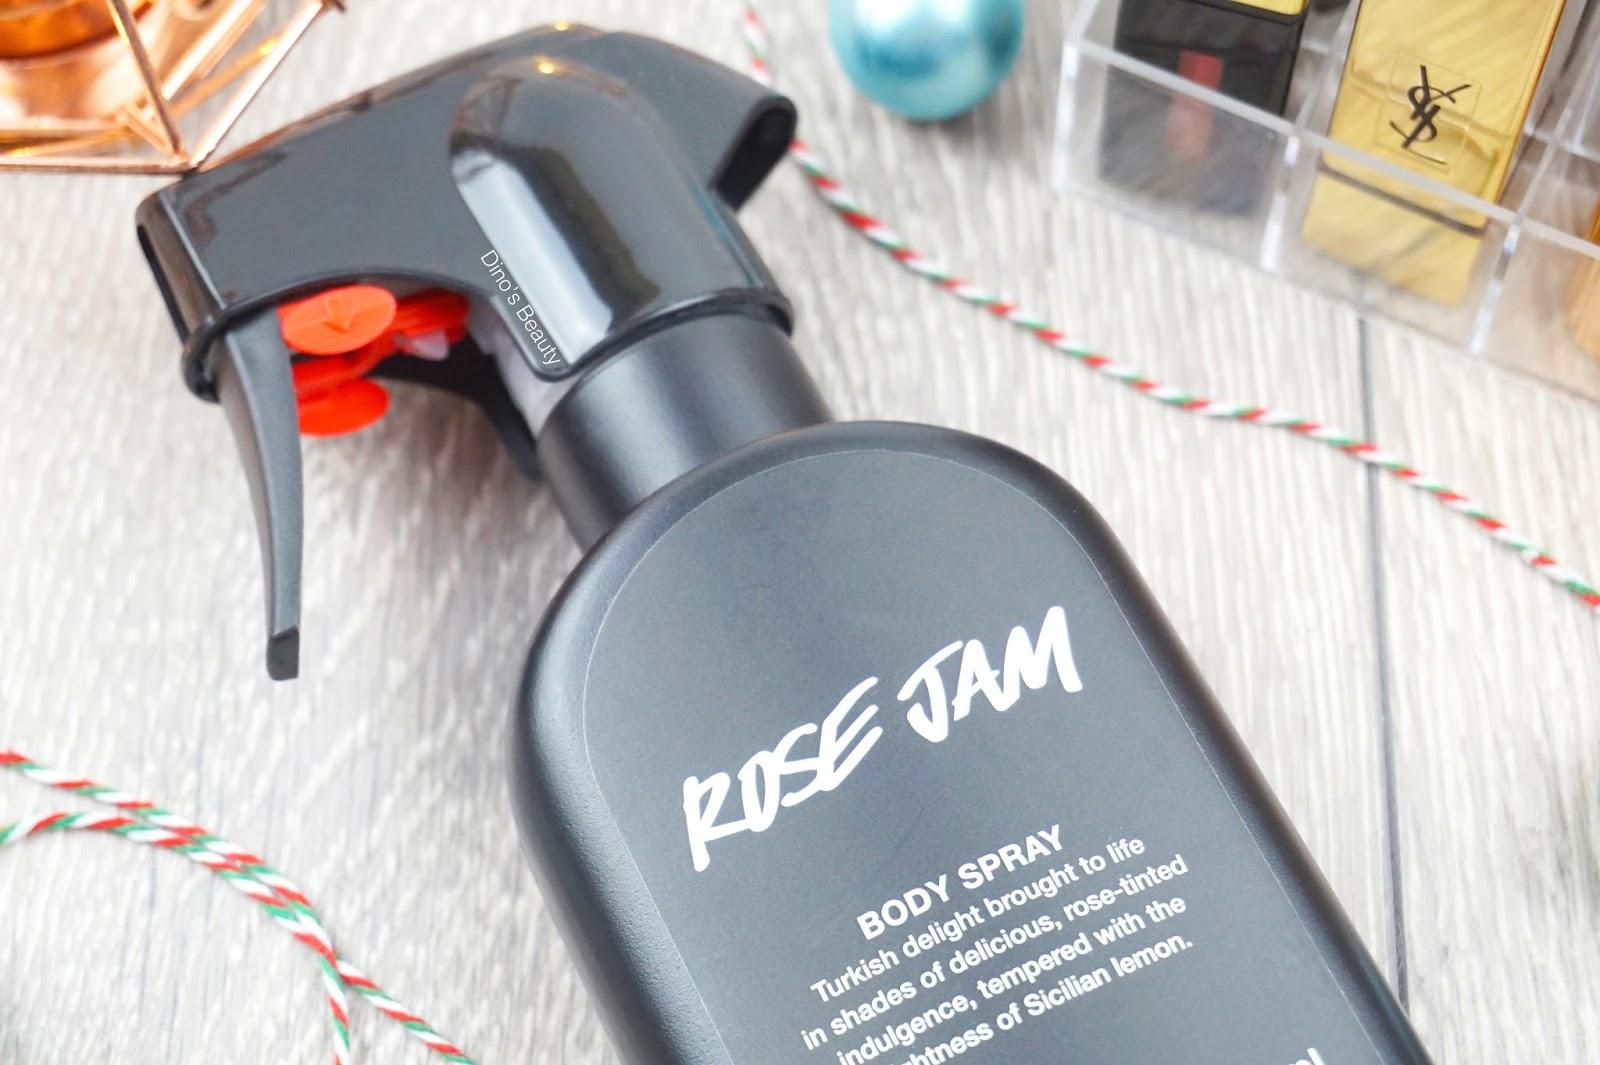 bbloggers, beauty, beauty bloggers, beauty review, Lush, Lush Nottingham, Rose Jam, Body Spray, rose, turkish delight, Rose Jam Body Spray, floral, notes, perfumed, rose petals